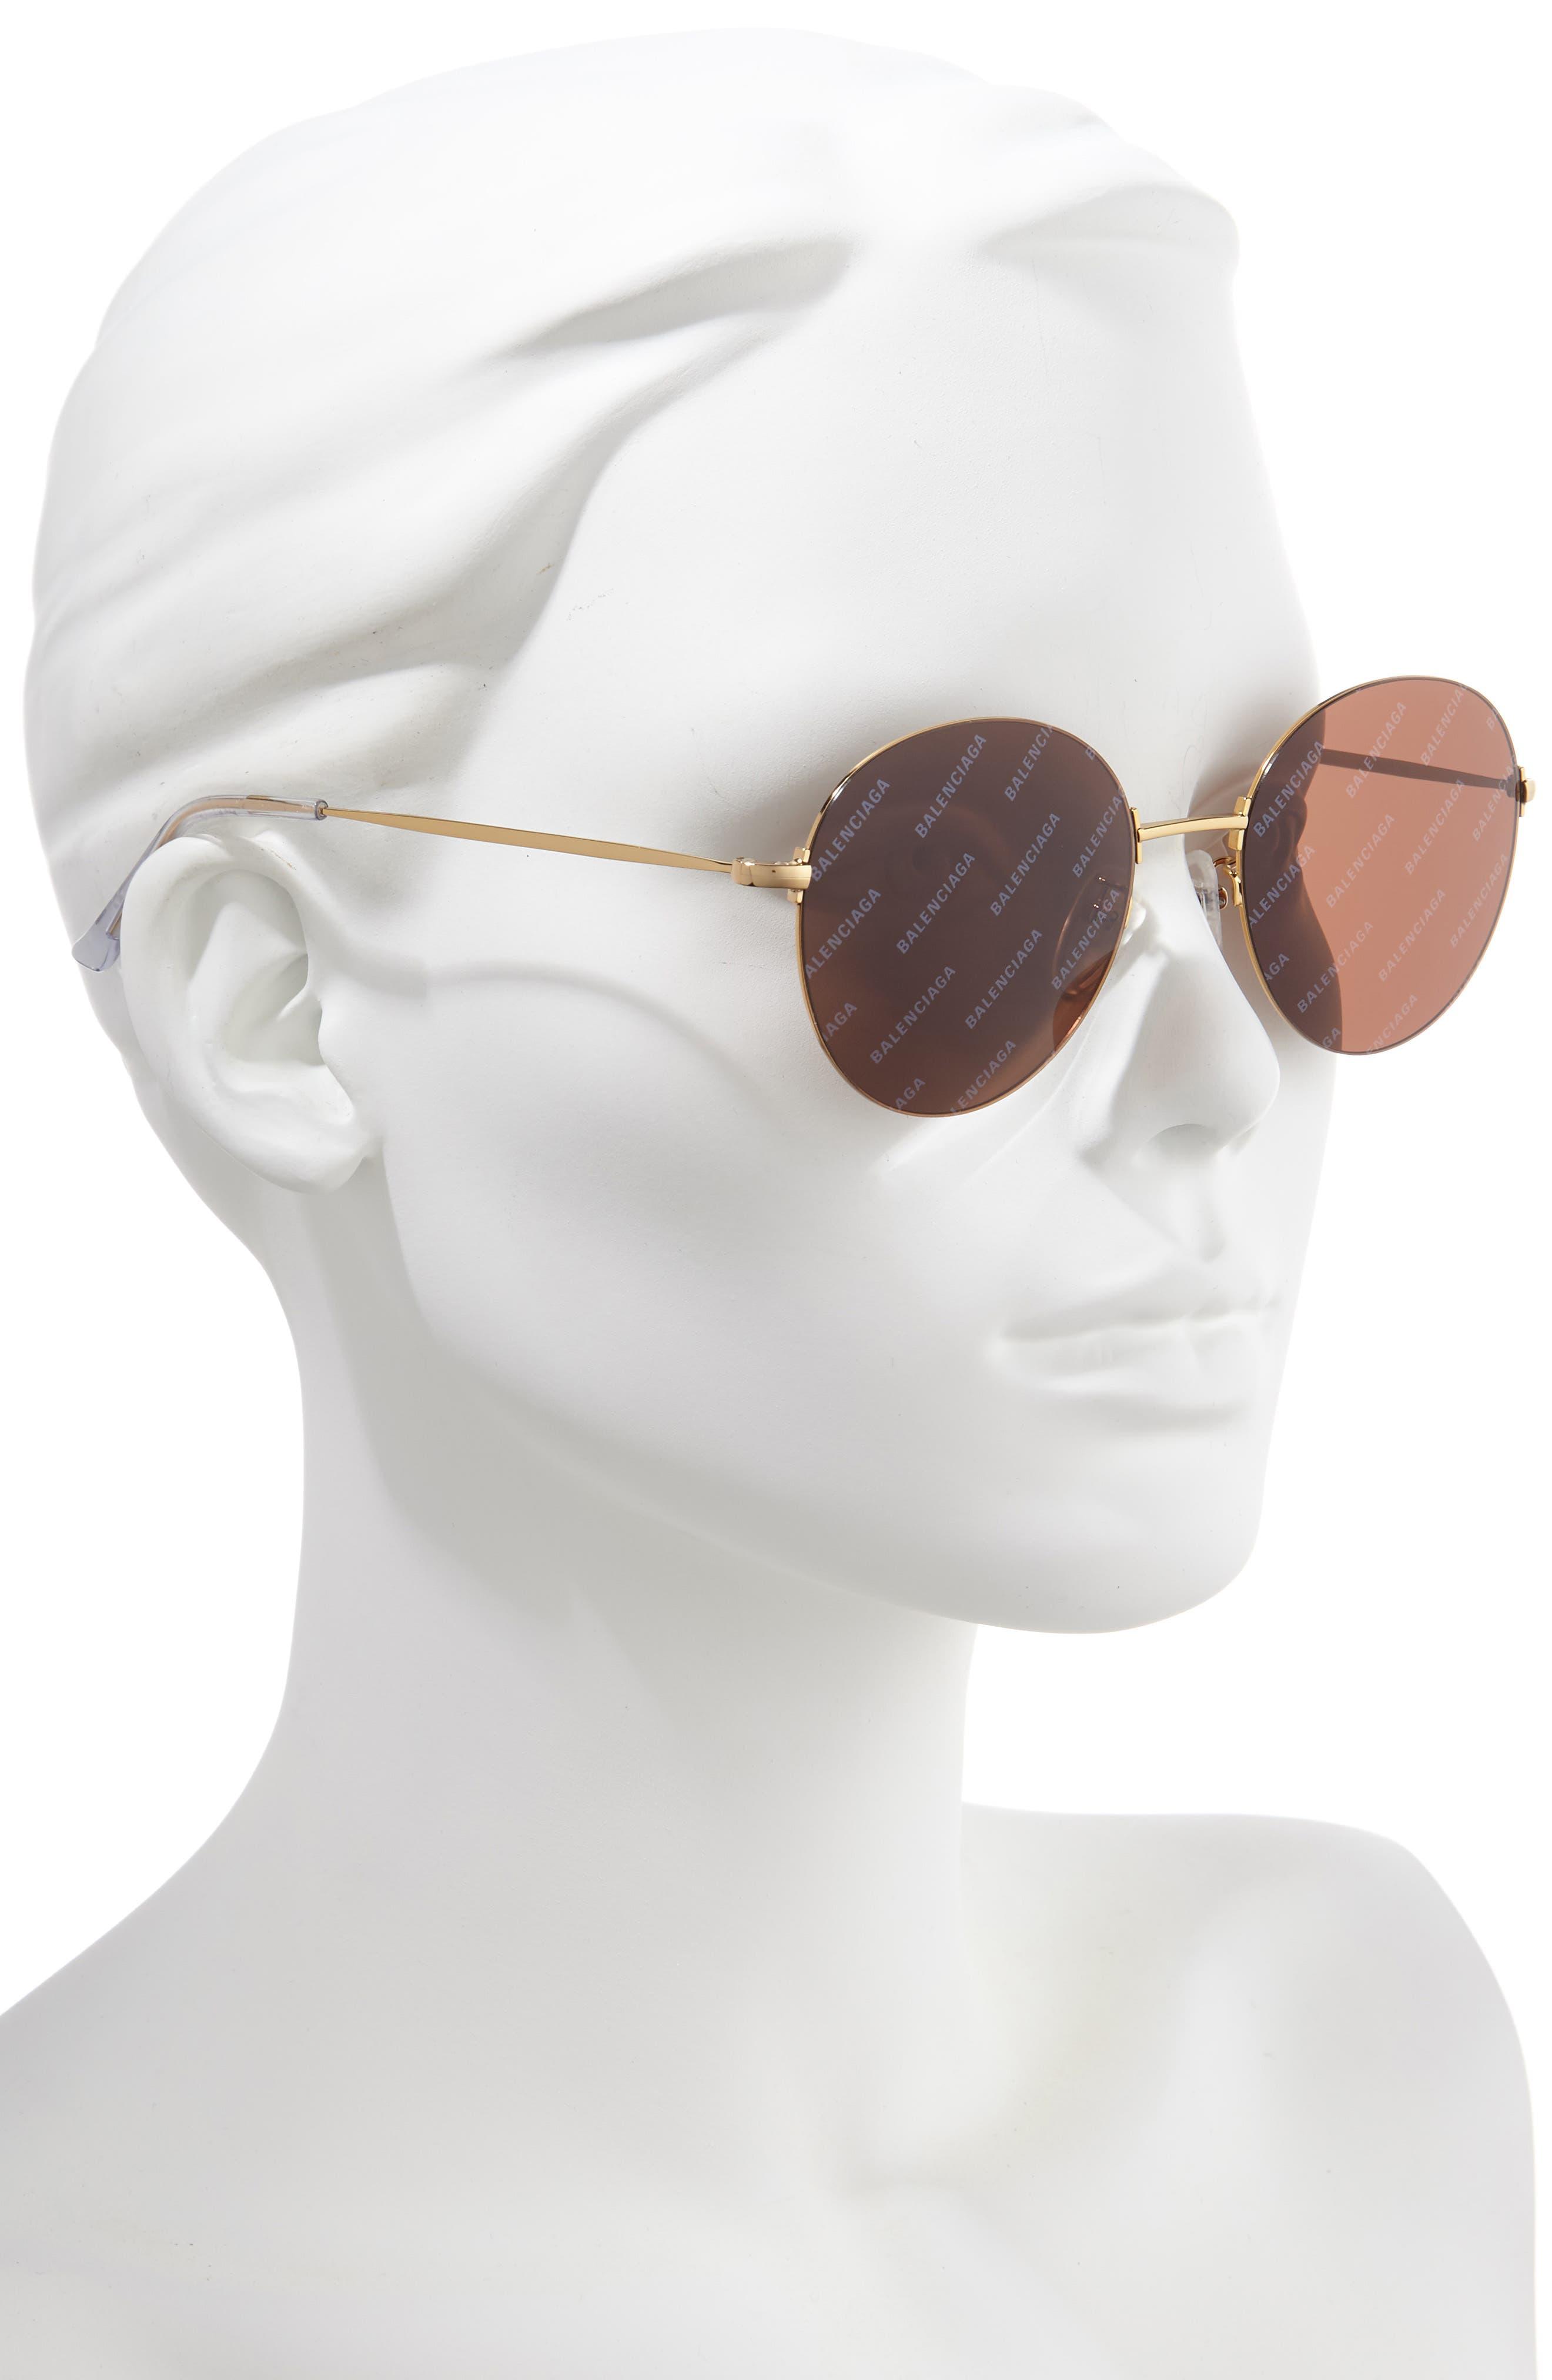 938453fb3c Balenciaga Sunglasses for Women